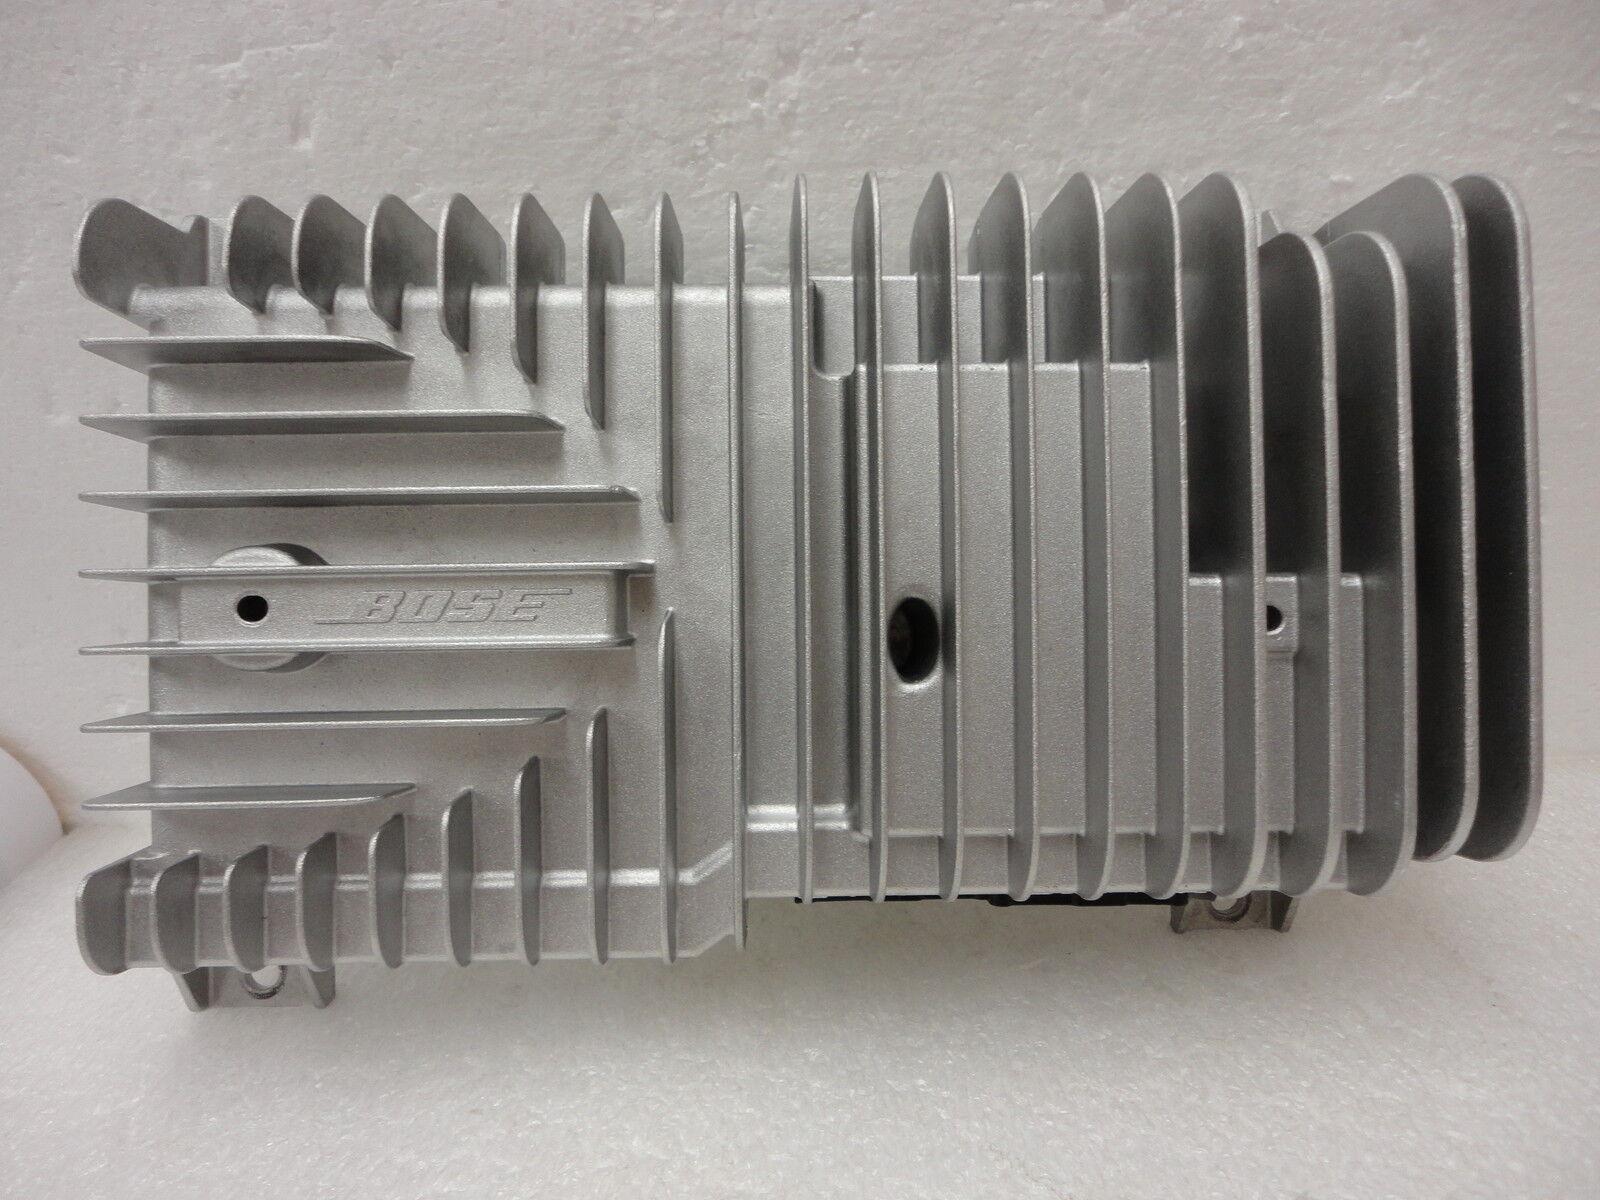 Nissan Altima 20052006 Factory Oem Amp Bose Amplifier Part Number